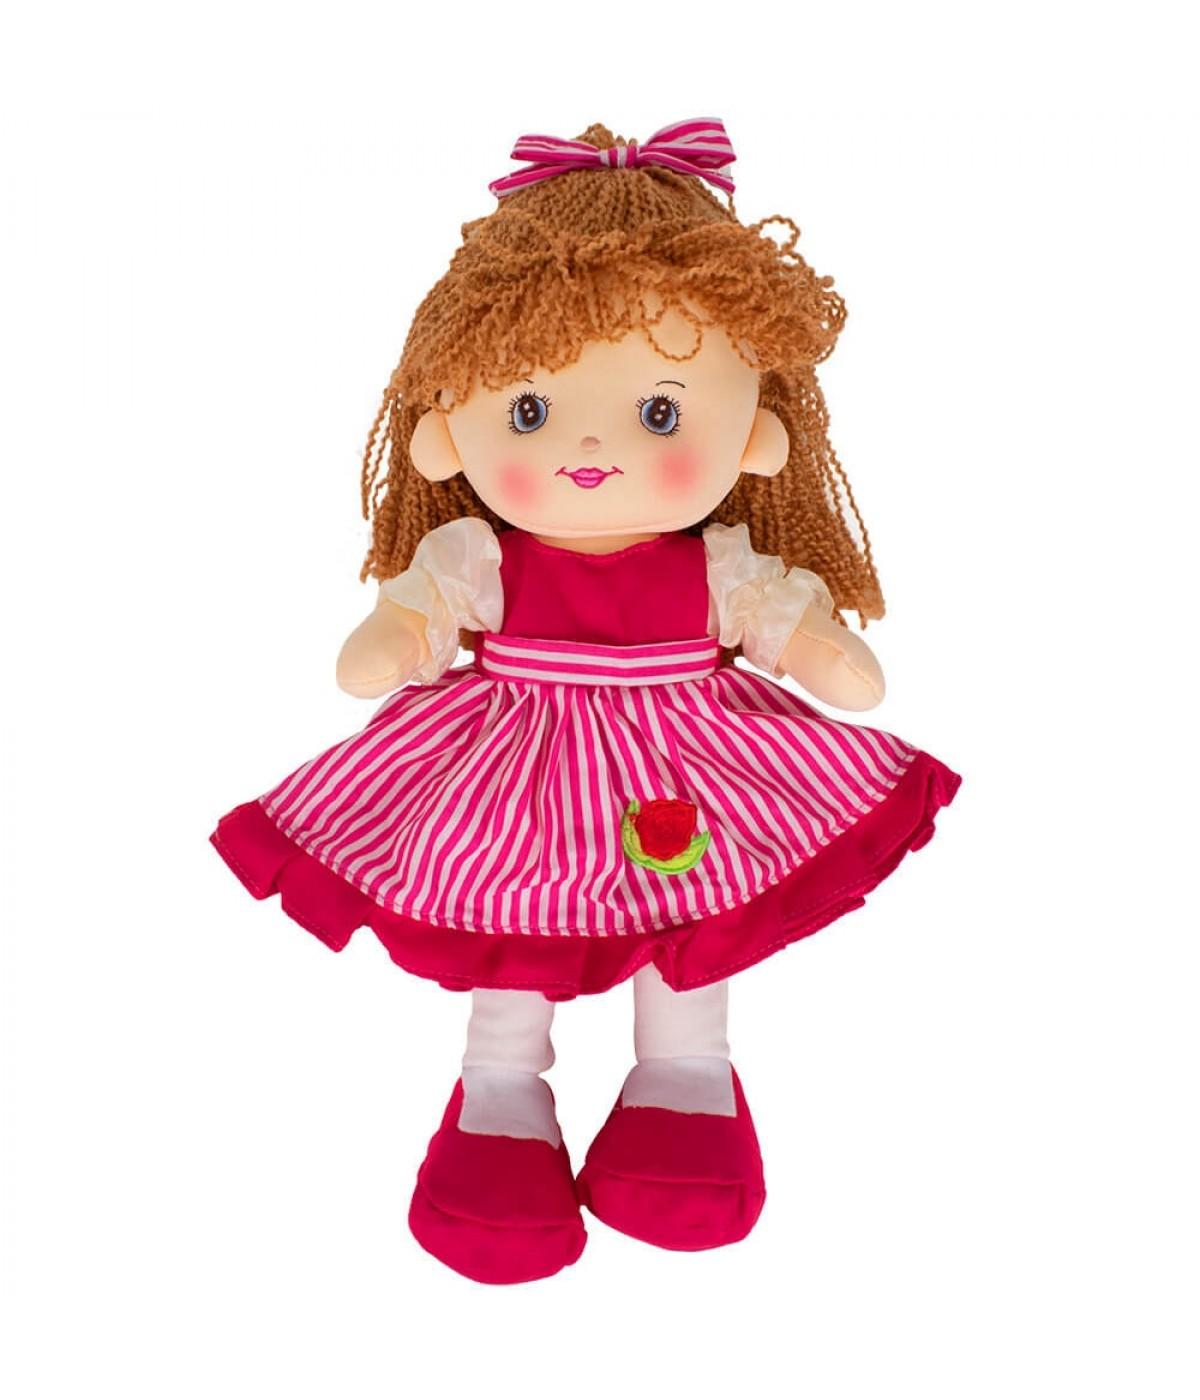 Boneca Laço Cabelo Vestido Pink 37cm